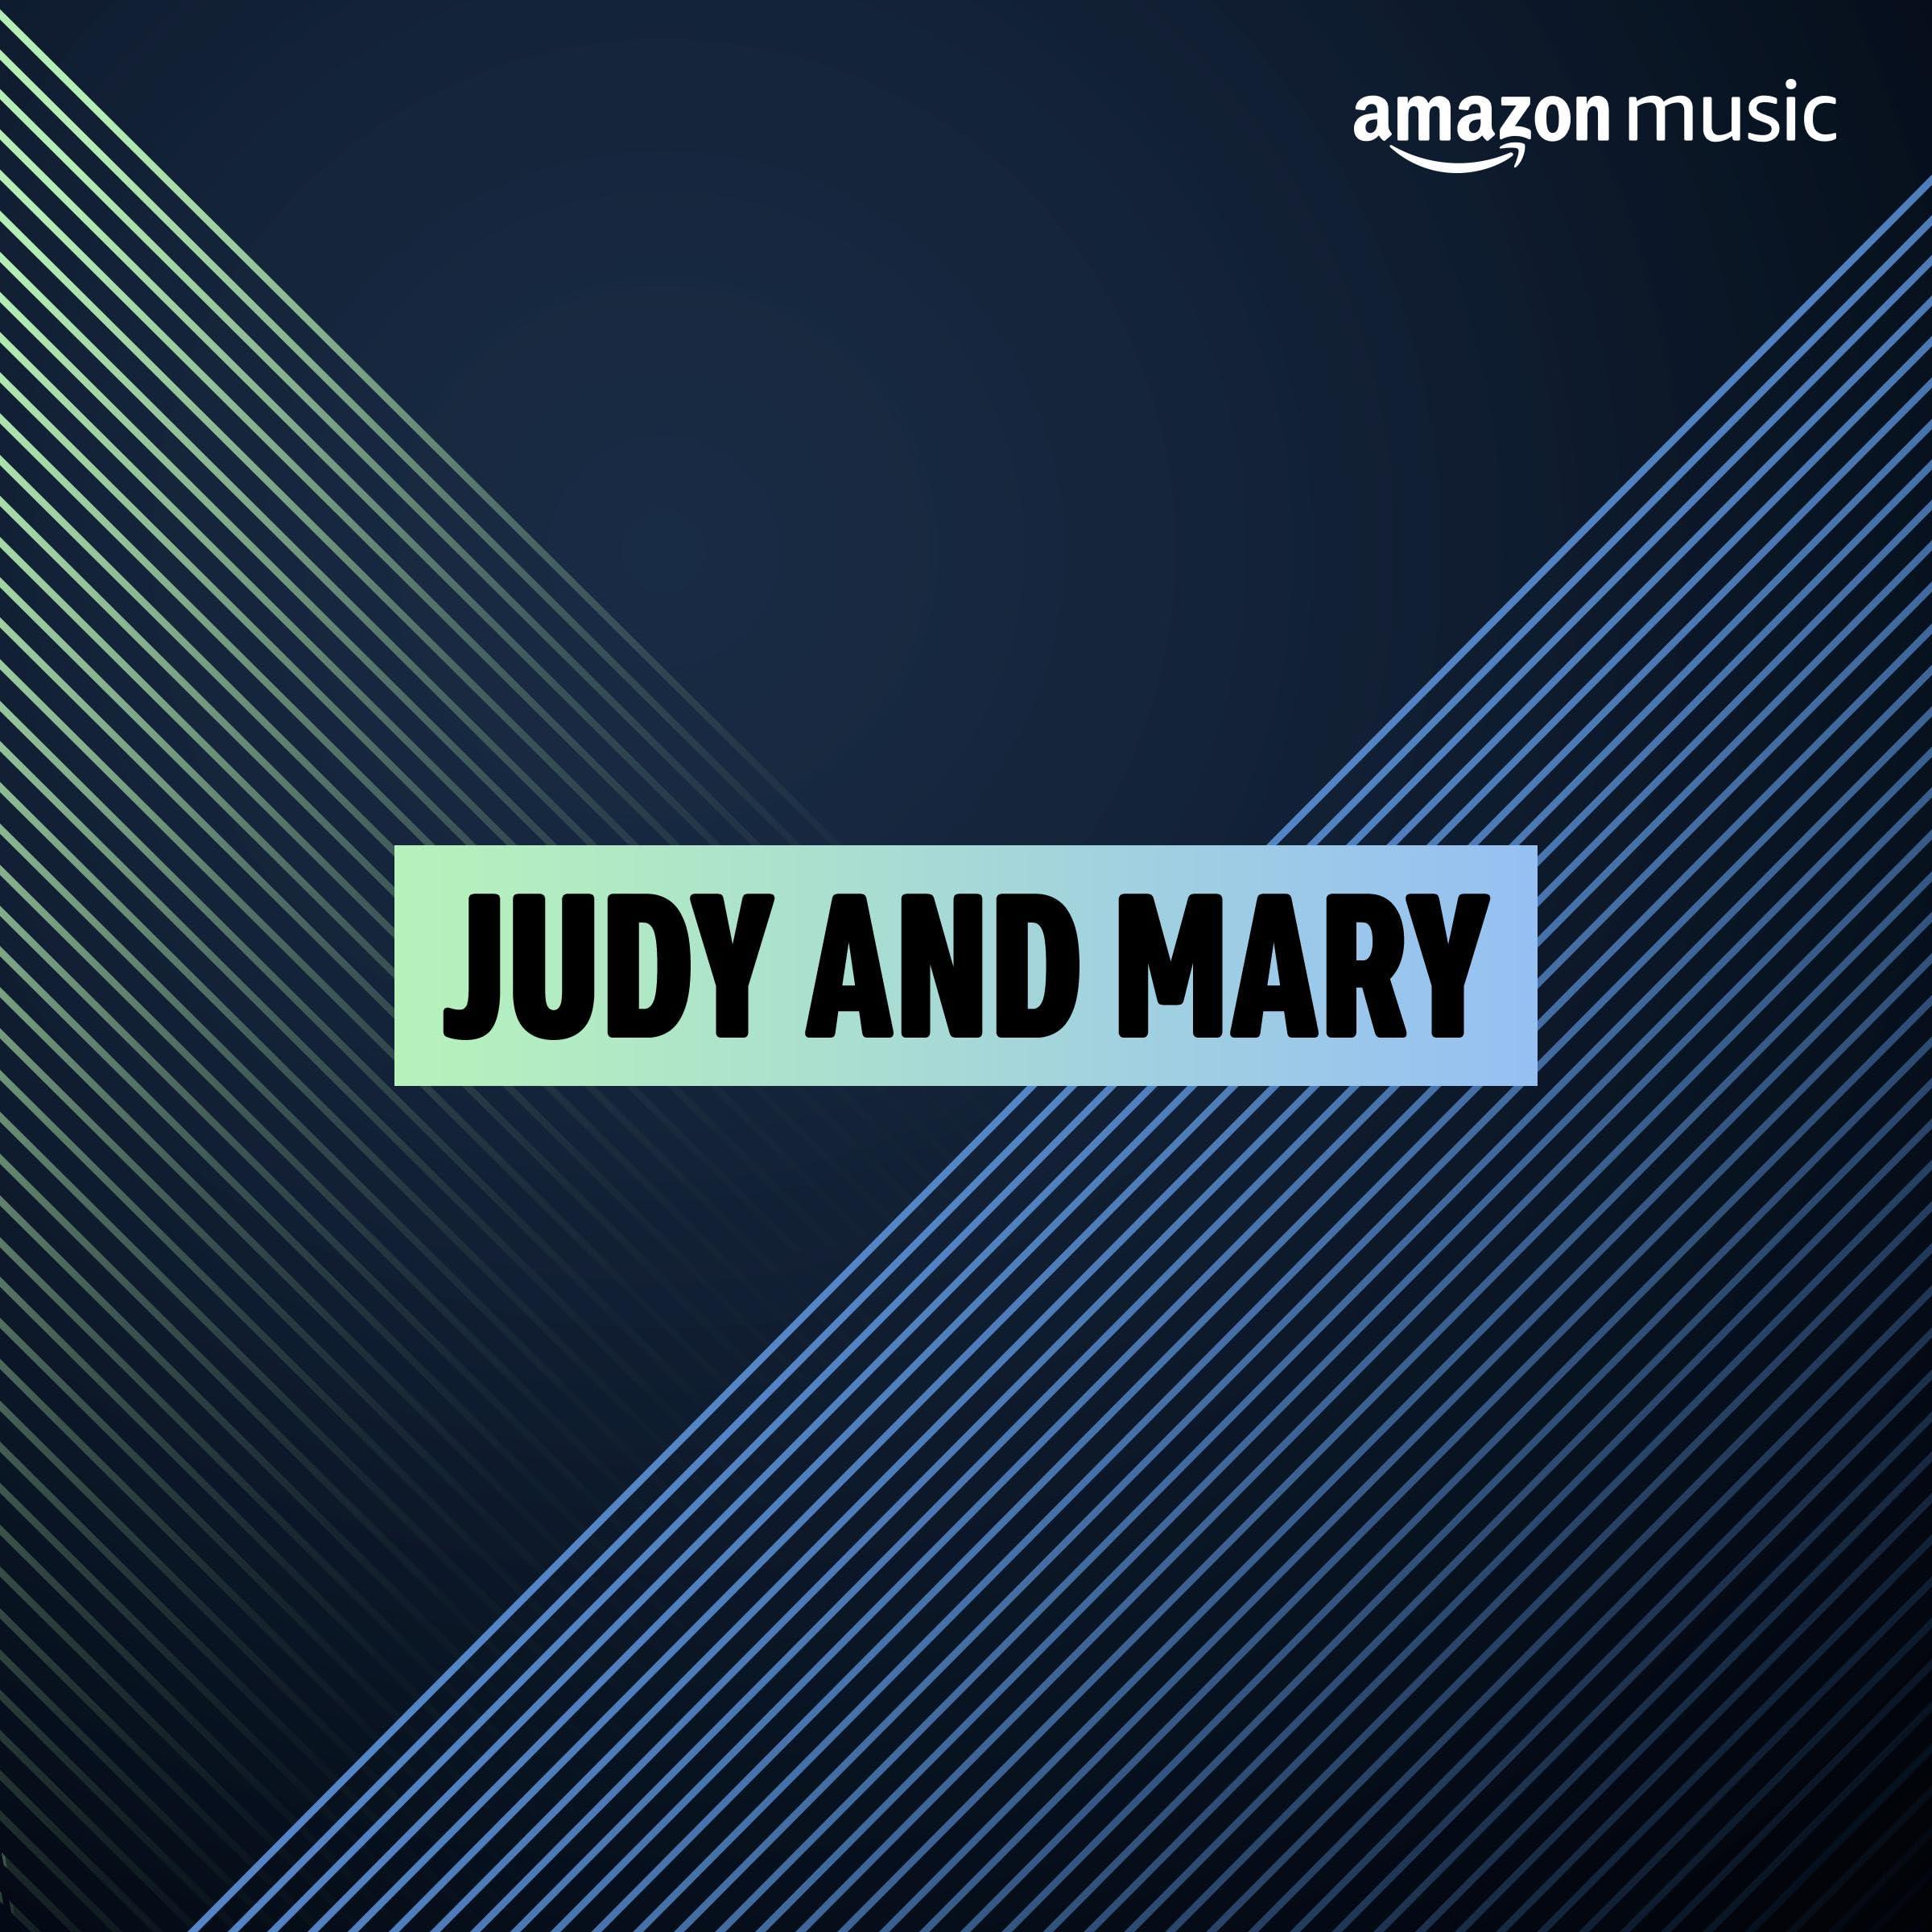 JUDY AND MARYを聴いているお客様におすすめ